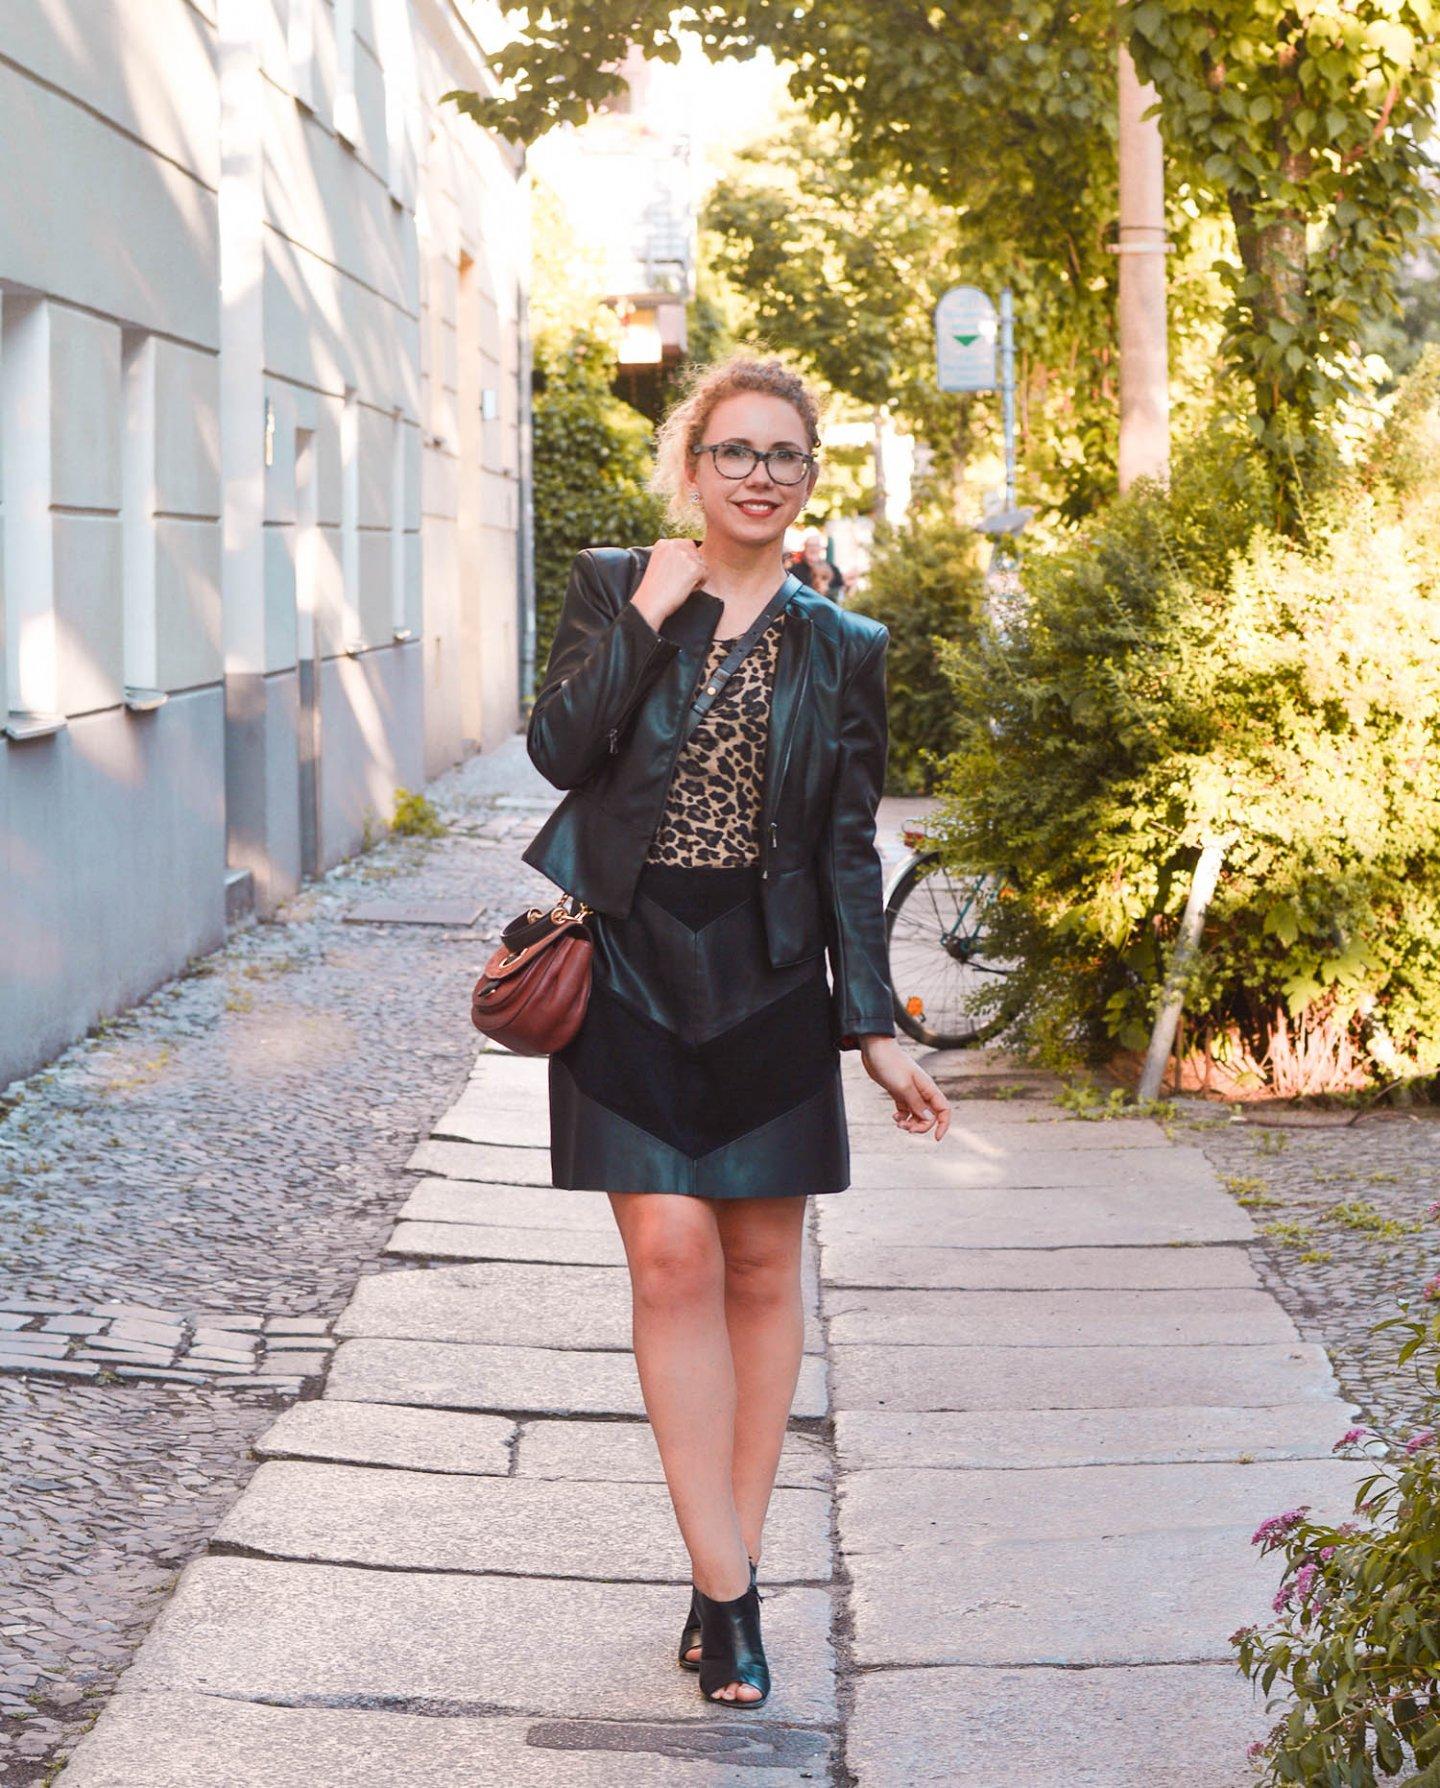 Leo-Print und Leder Outfit